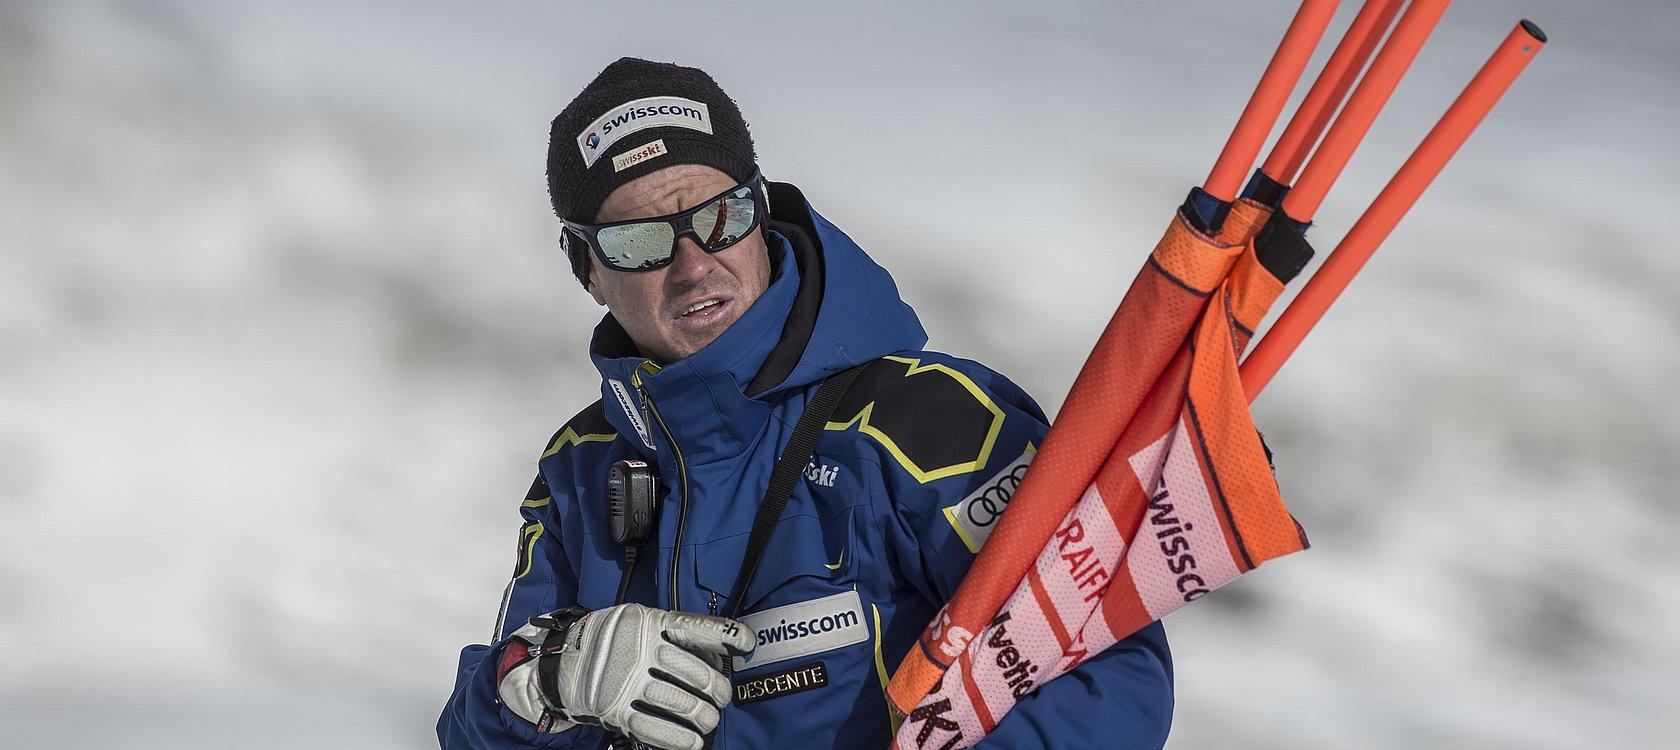 Andi Evers – der Experte | Swiss Ski